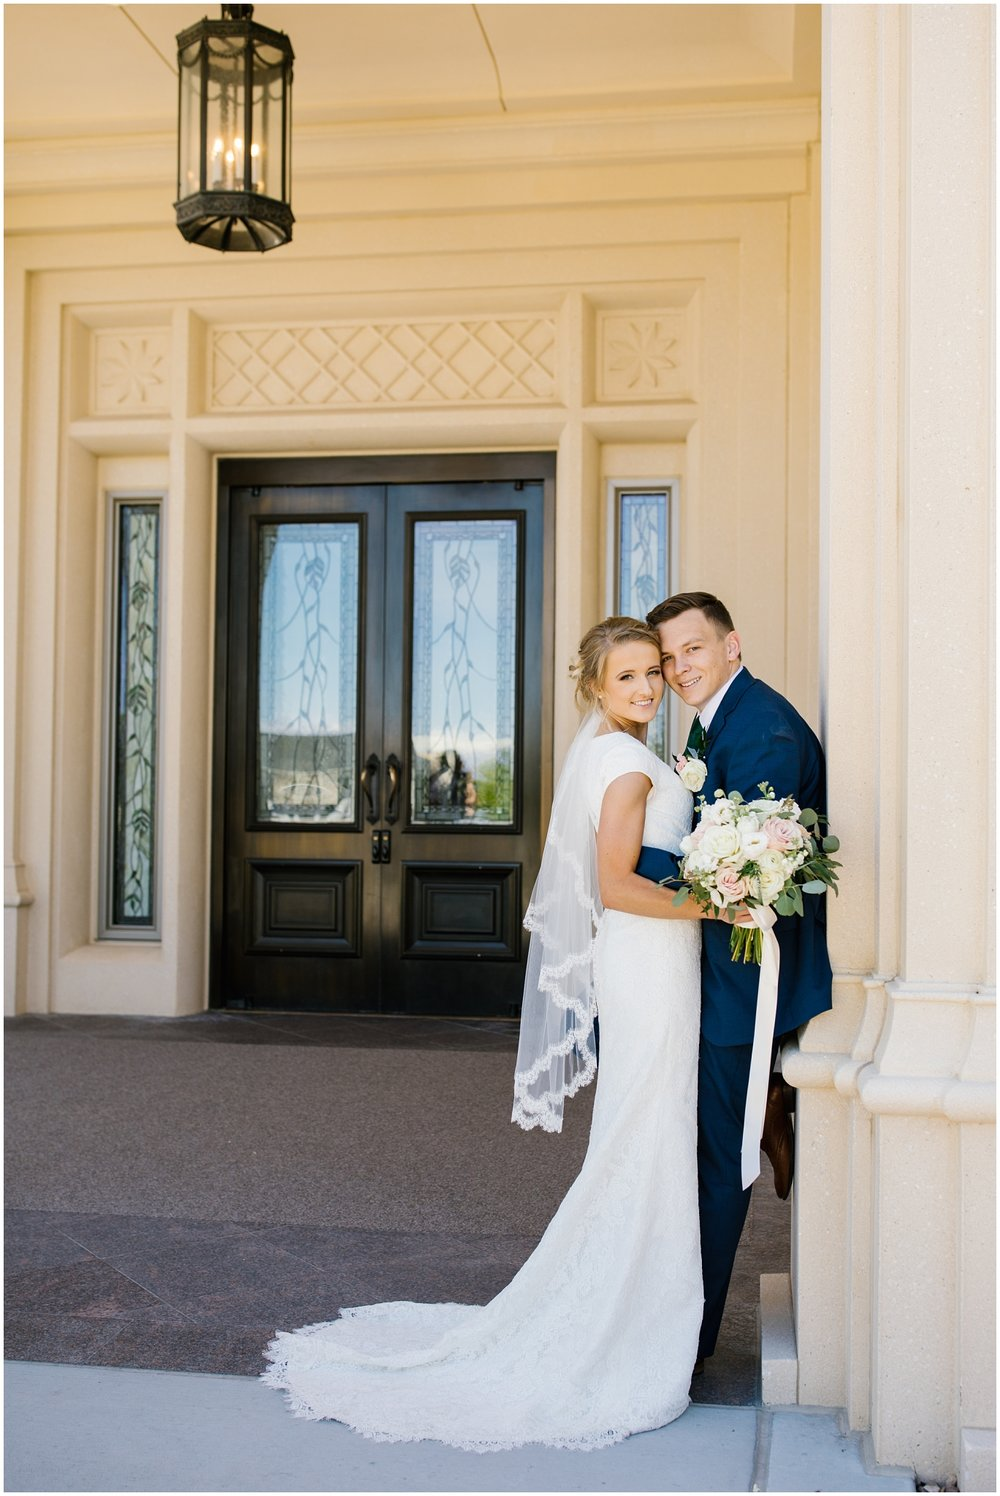 TA-Wedding-149_Lizzie-B-Imagery-Utah-Wedding-Photographer-Park-City-Salt-Lake-City-Thanksgiving-Point-Ashton-Gardens-Lehi-Utah.jpg